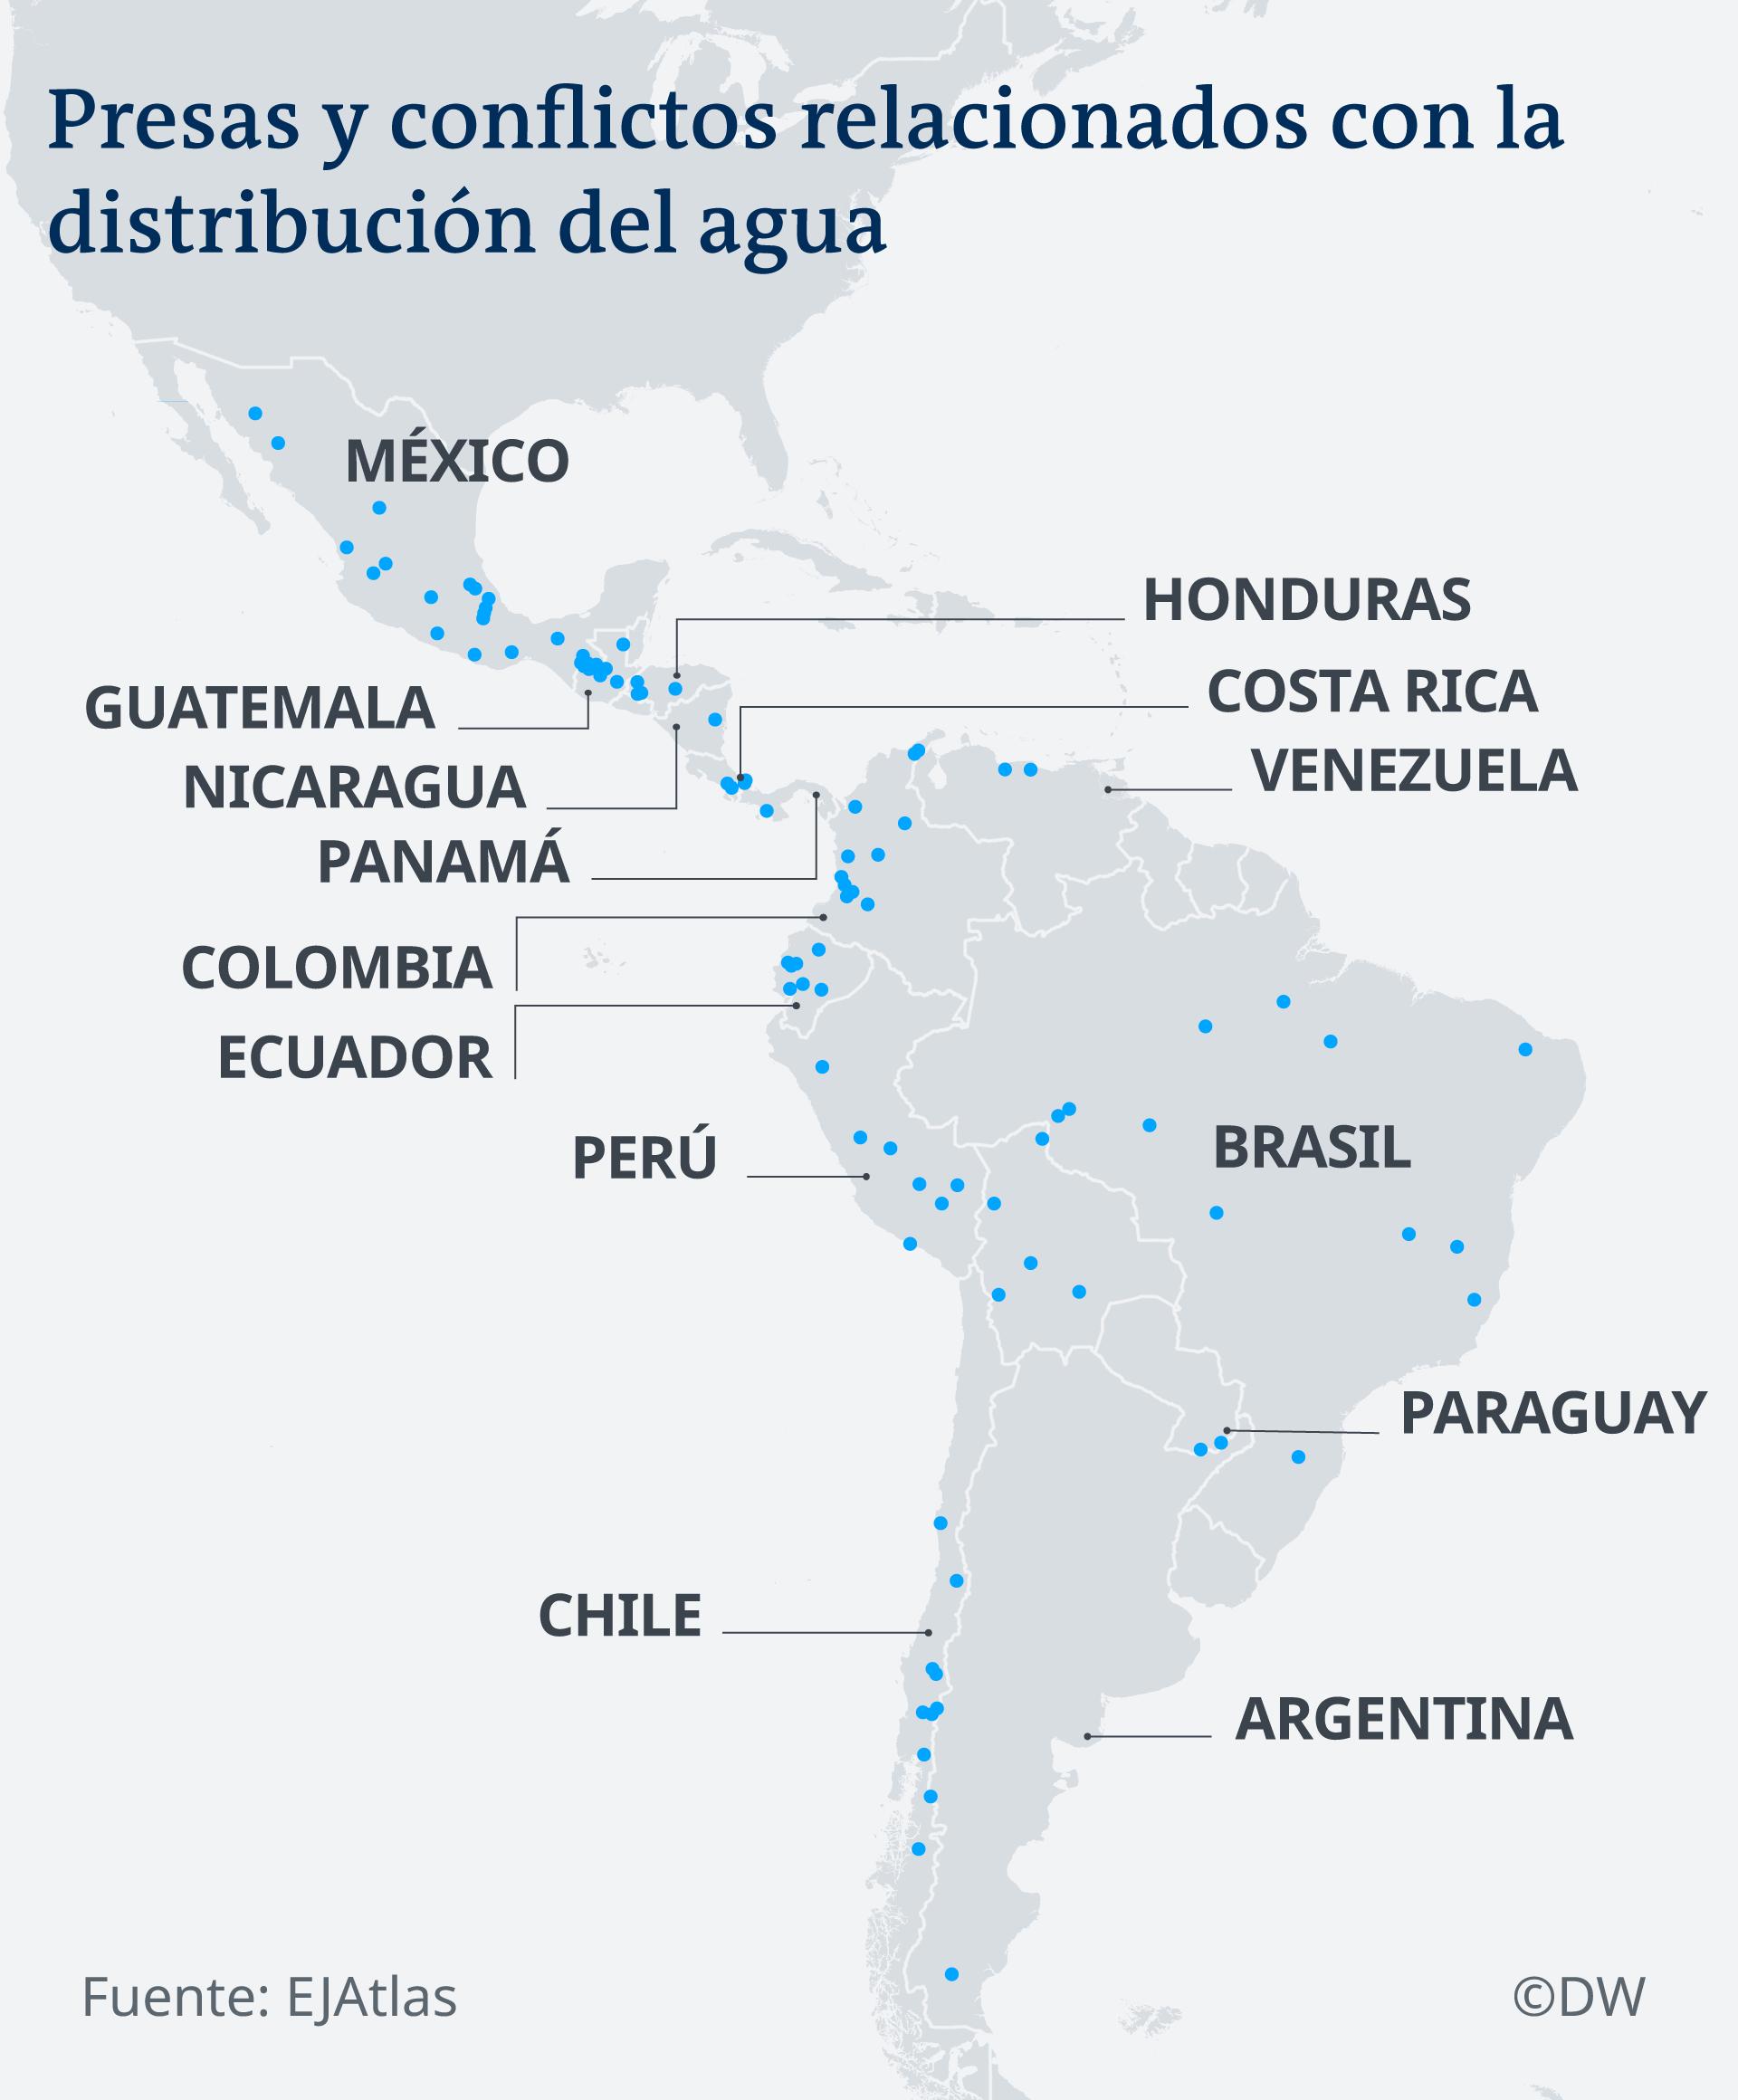 Infografik Karte Wasserversorgungs Konfliktgebiete in Lateinamerika ES